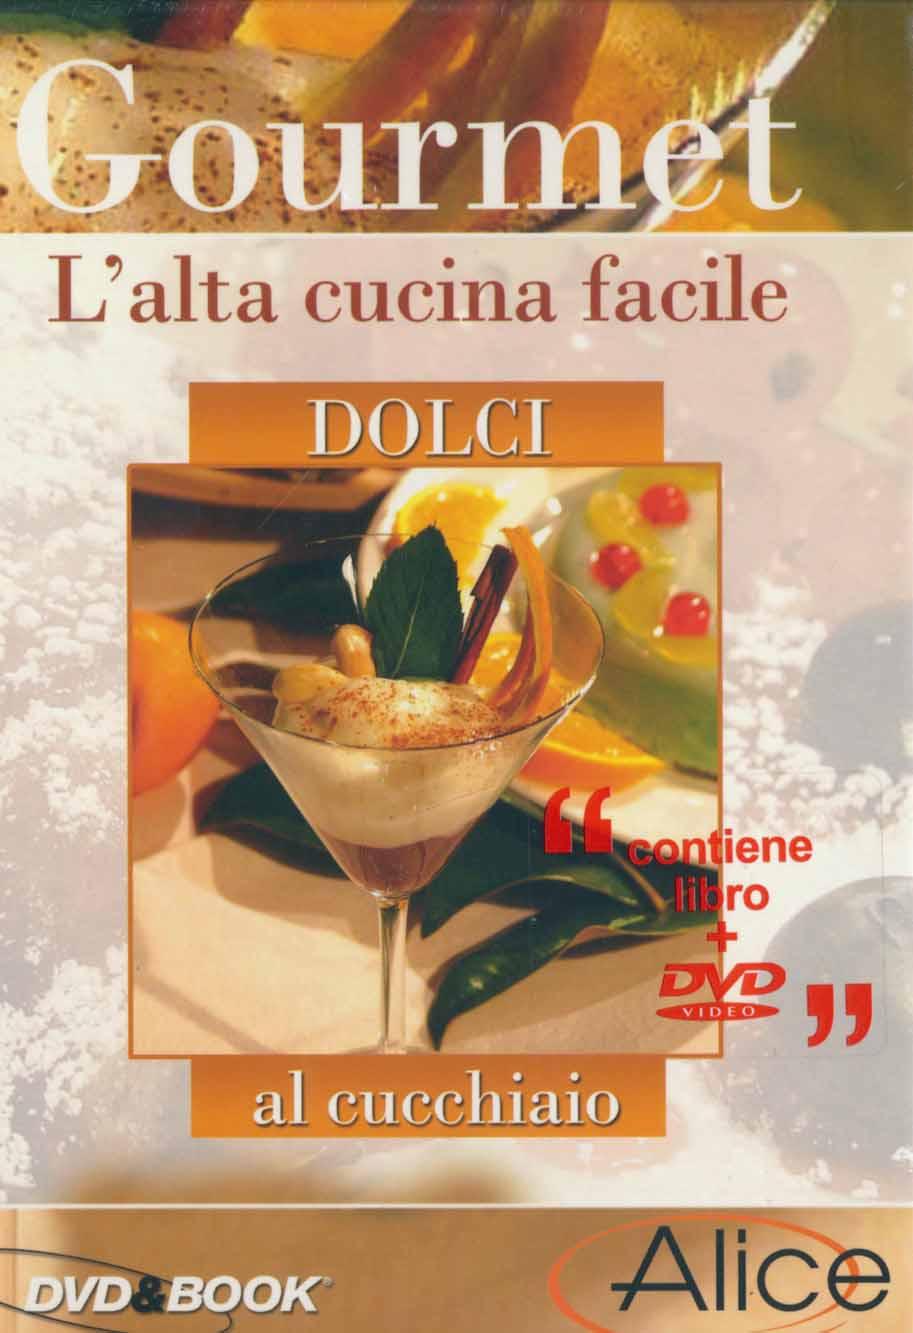 Gourmet l 39 alta cucina facile dolci al cucchiaio dvd for Ricette alta cucina italiana